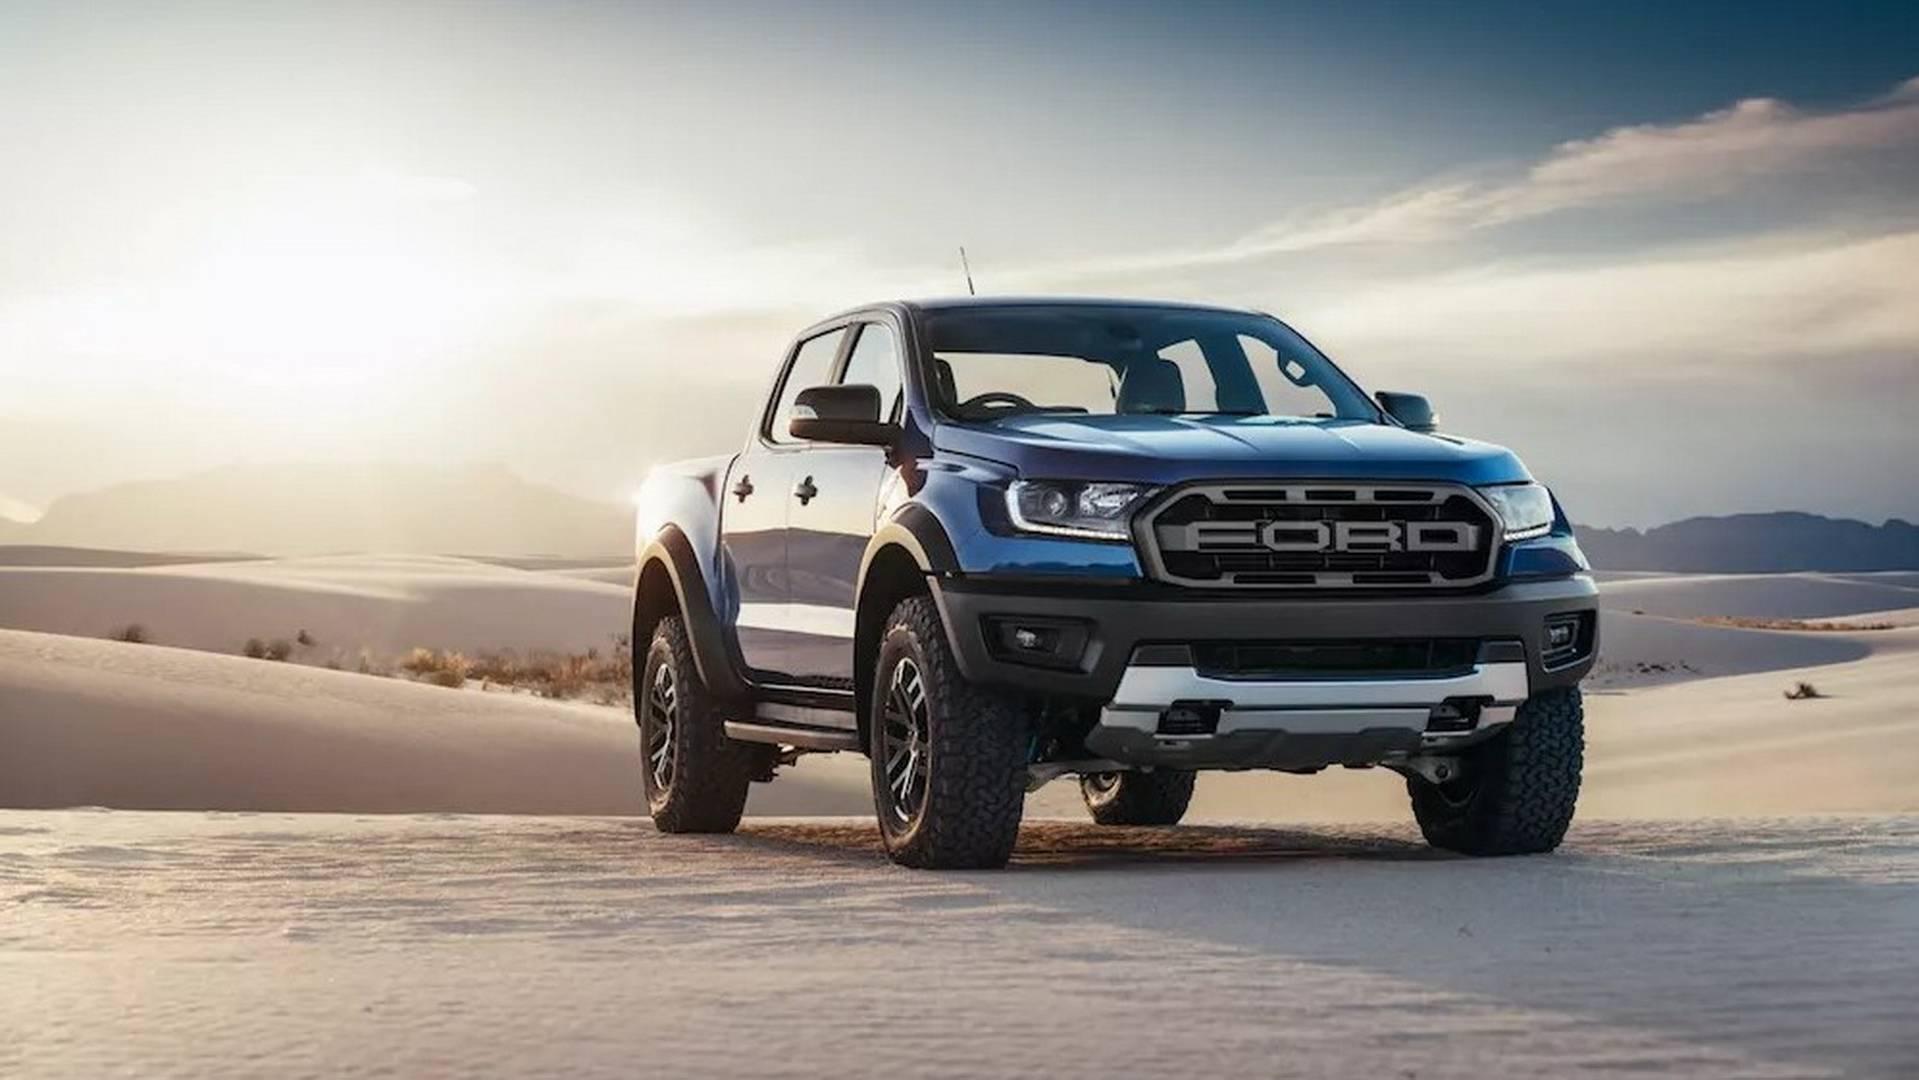 2019 ford ranger raptor فورد رنجر رپتور با ۲۱۰ بیتوربو دیزل اسب بخار می شود   اجاره ماشین